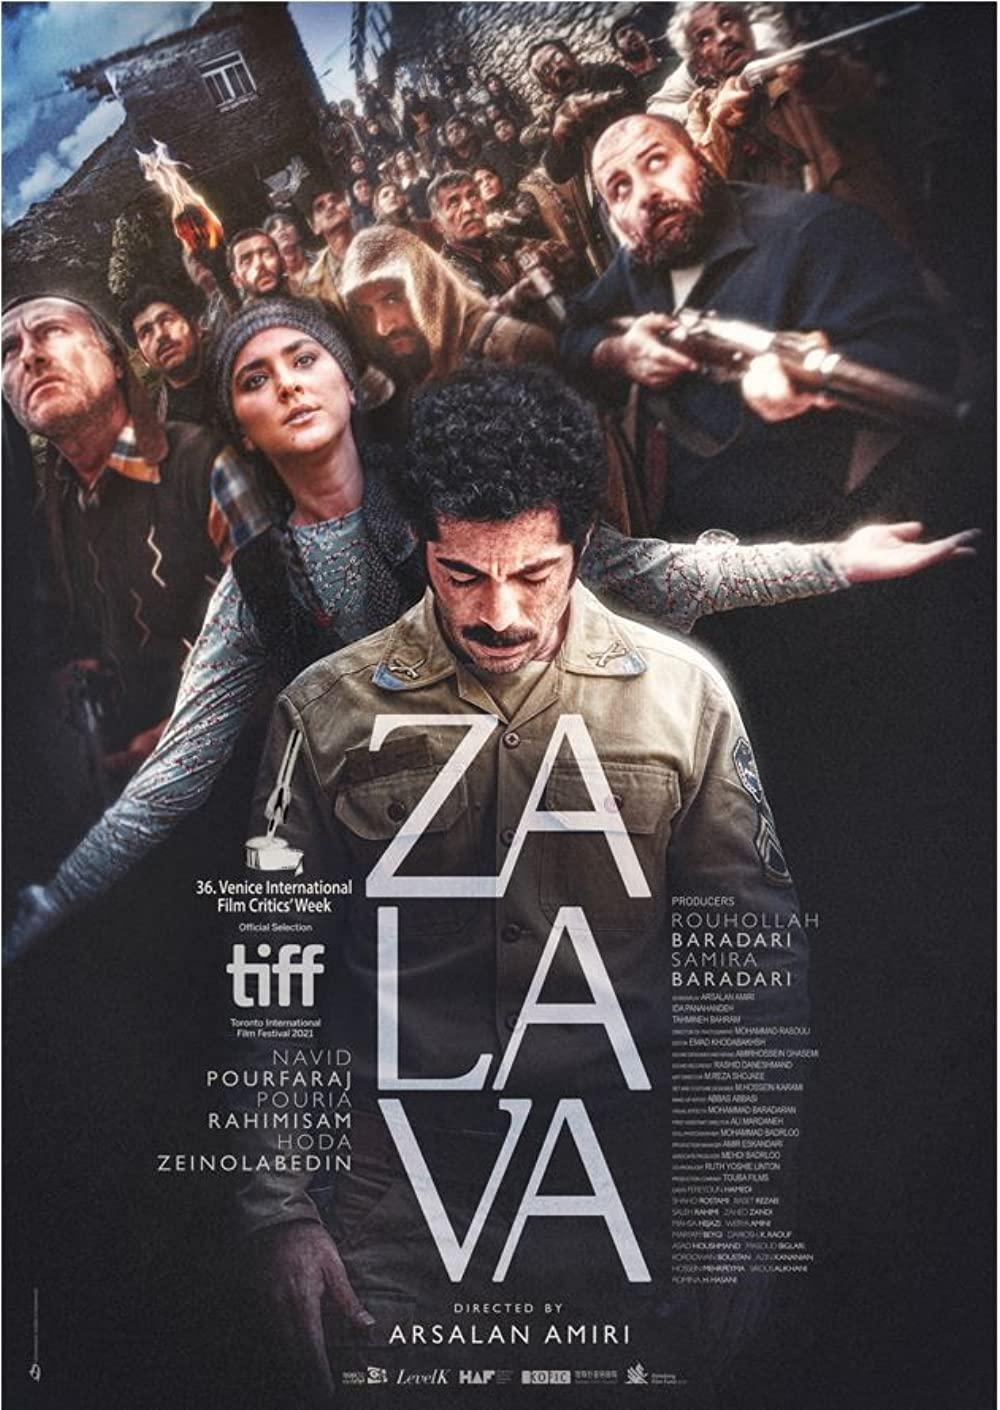 Zalava Film Review